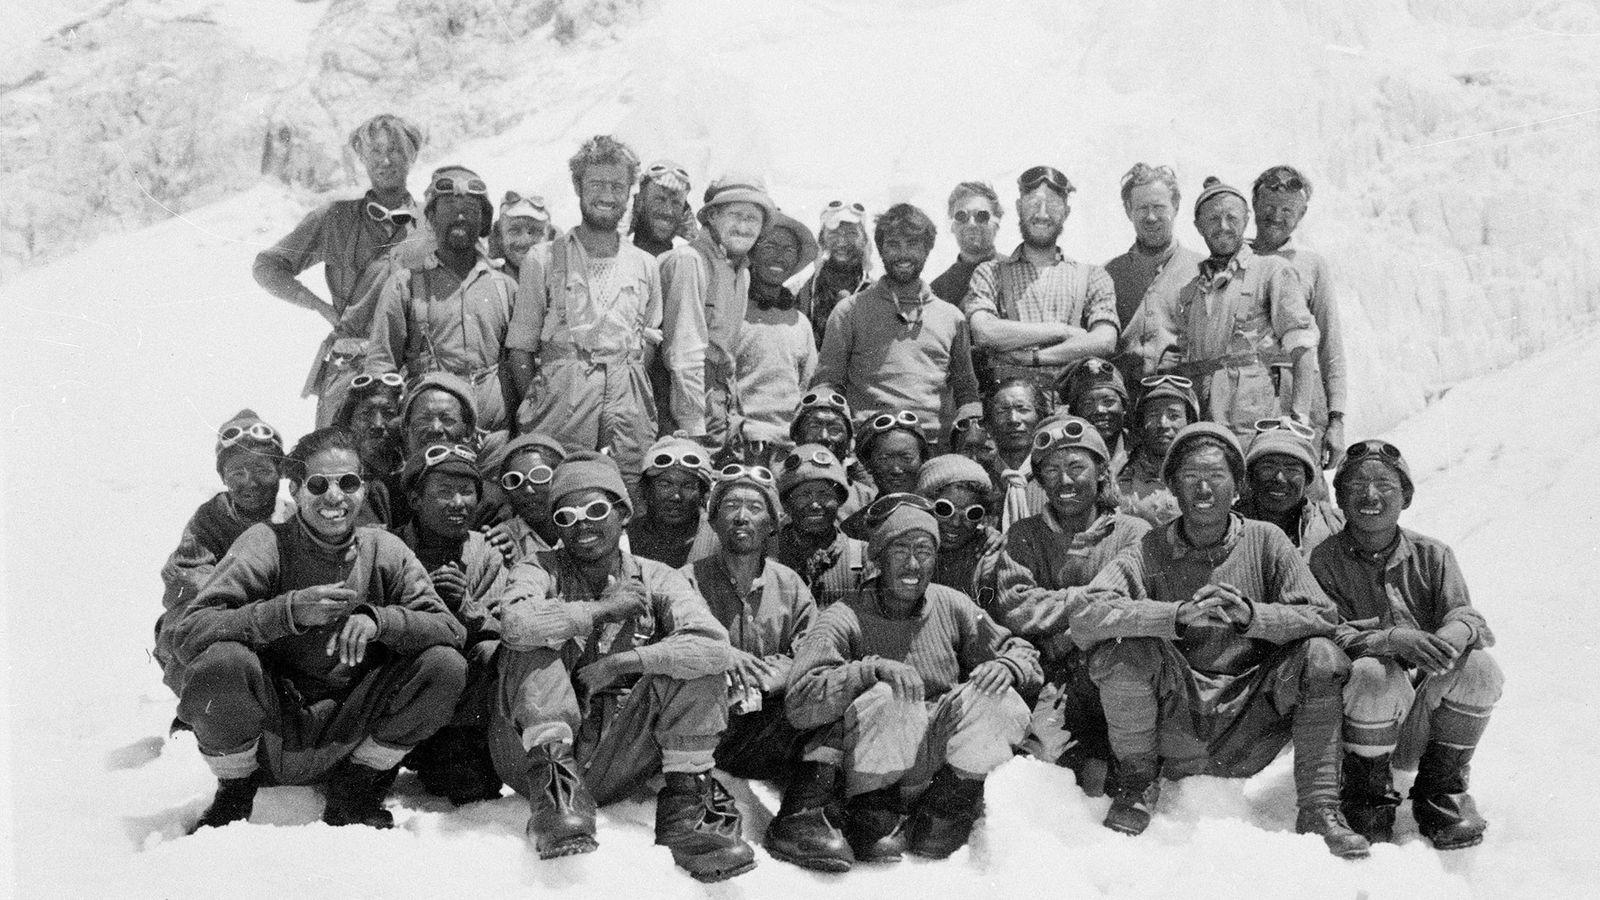 Kanchha Sherpa, Edmund Hillary,  Tenzing Norgay und Team